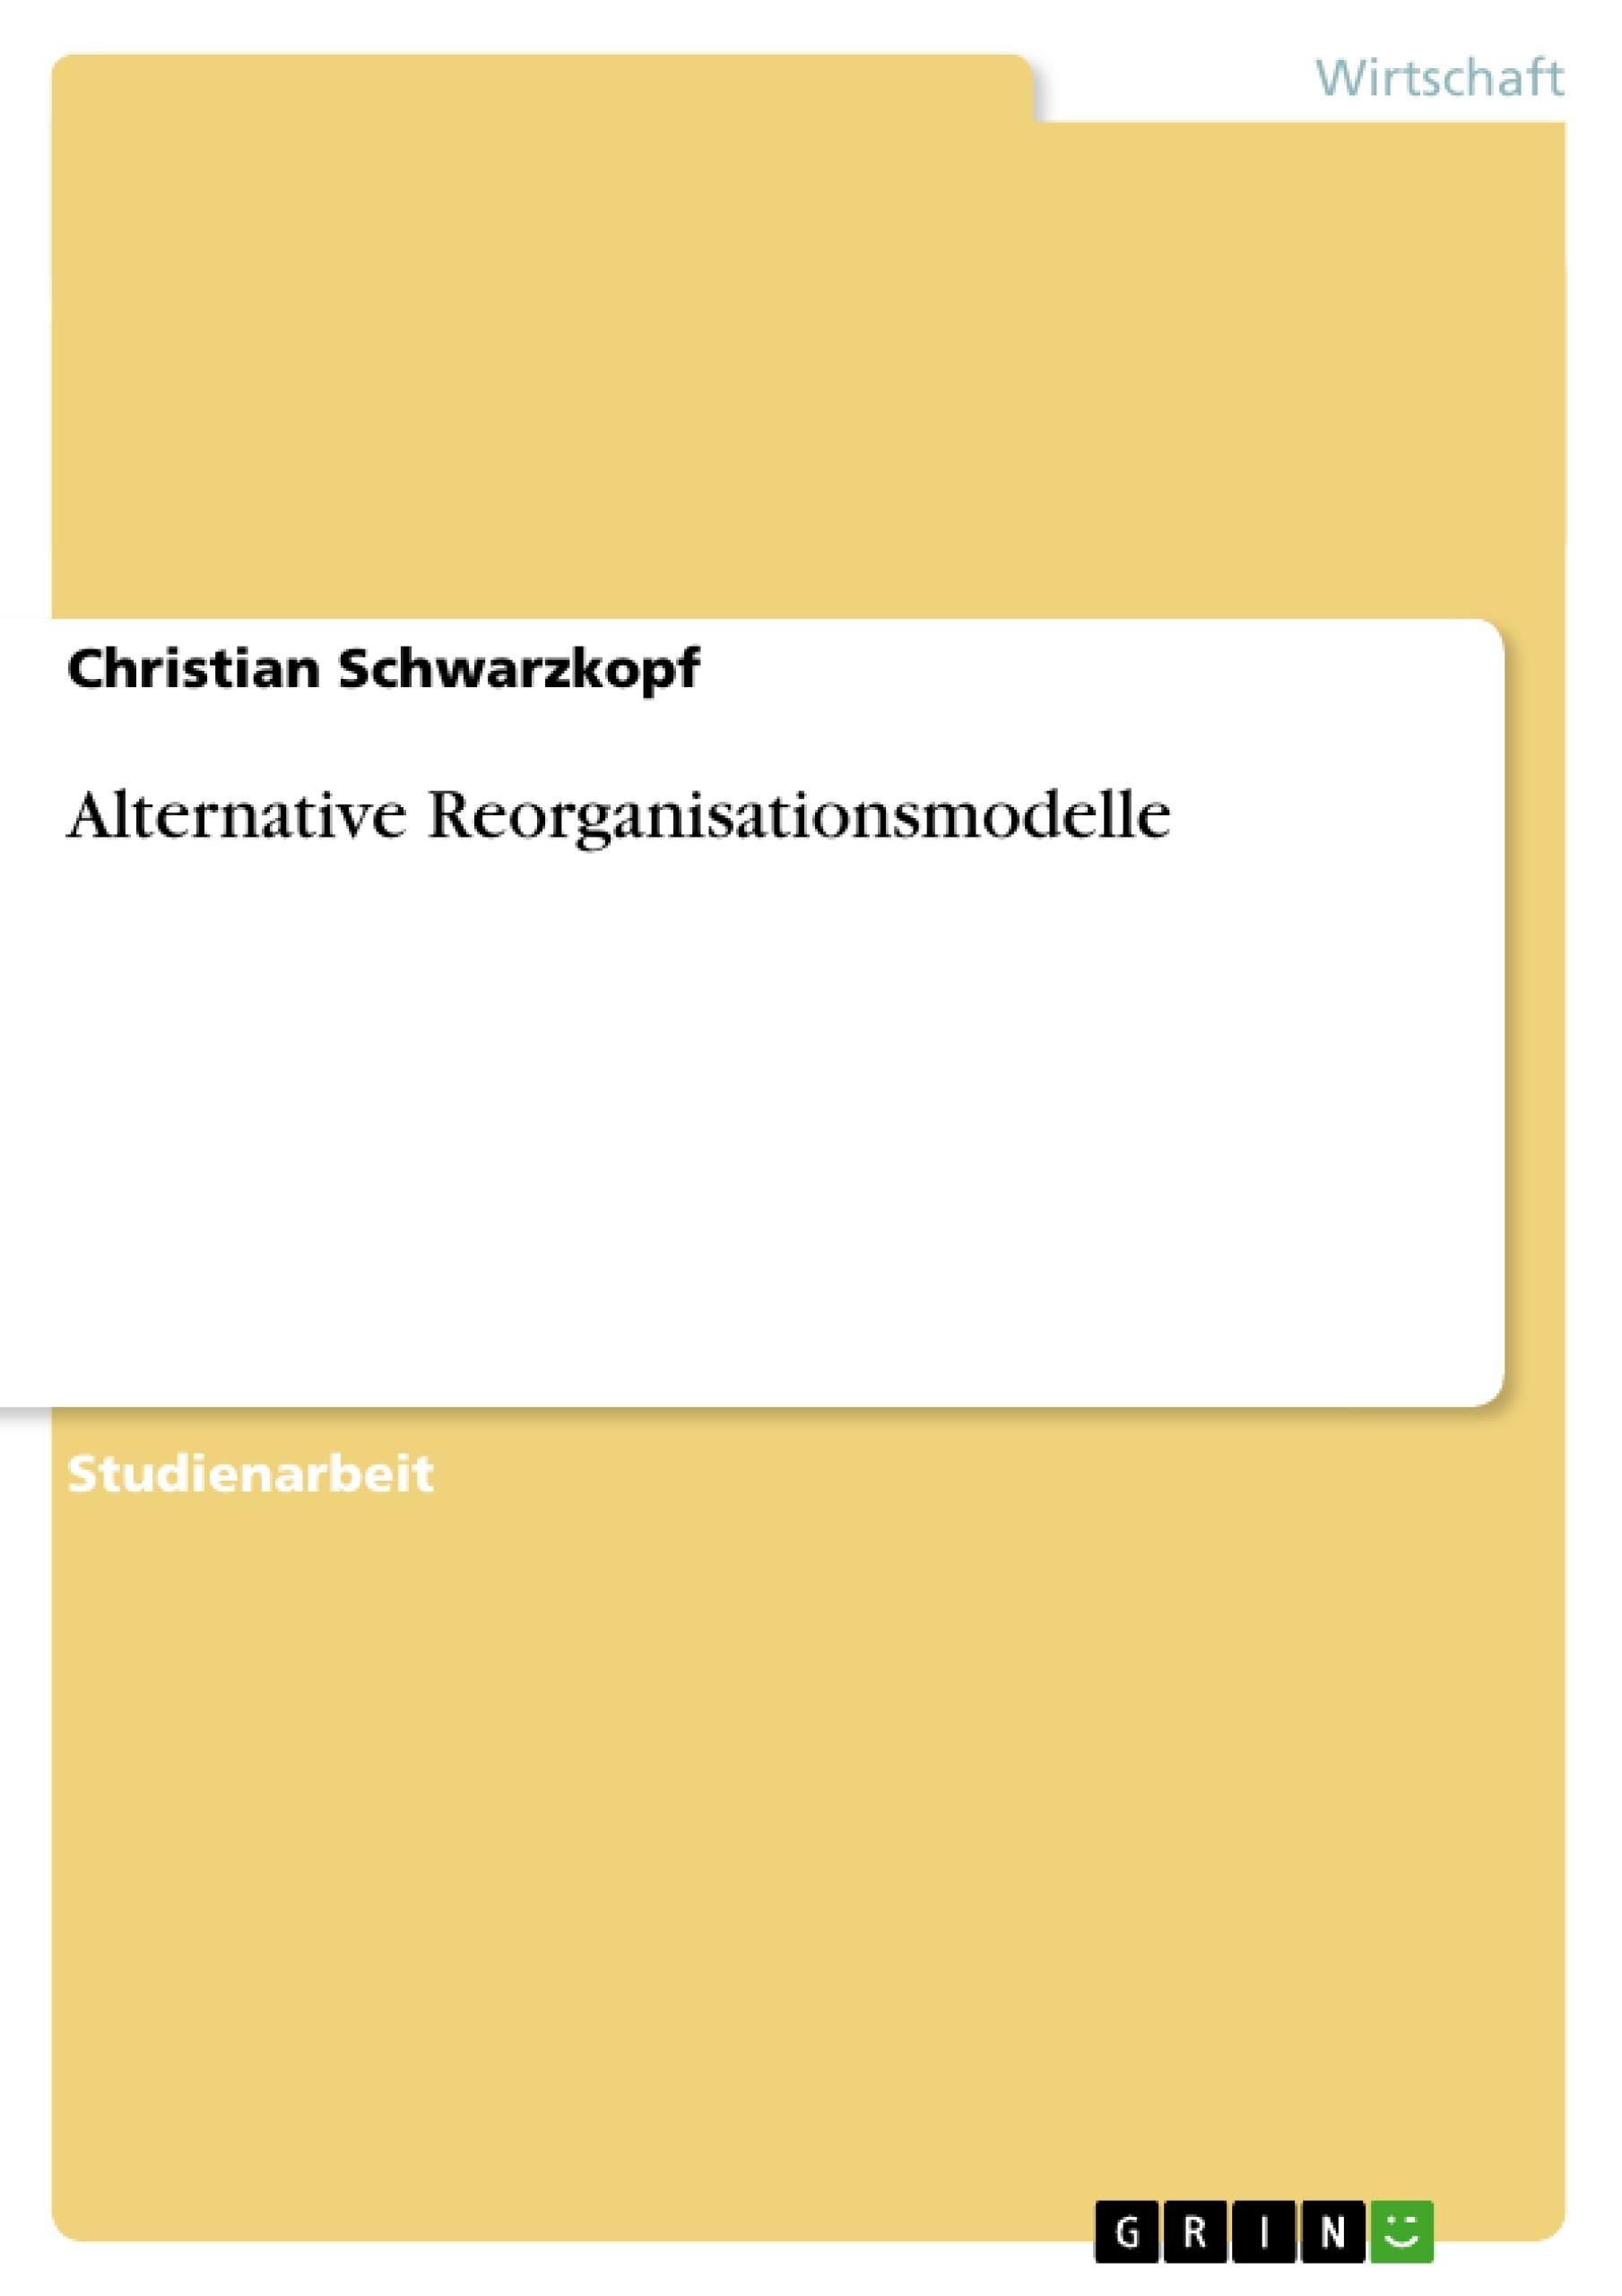 Titel: Alternative Reorganisationsmodelle